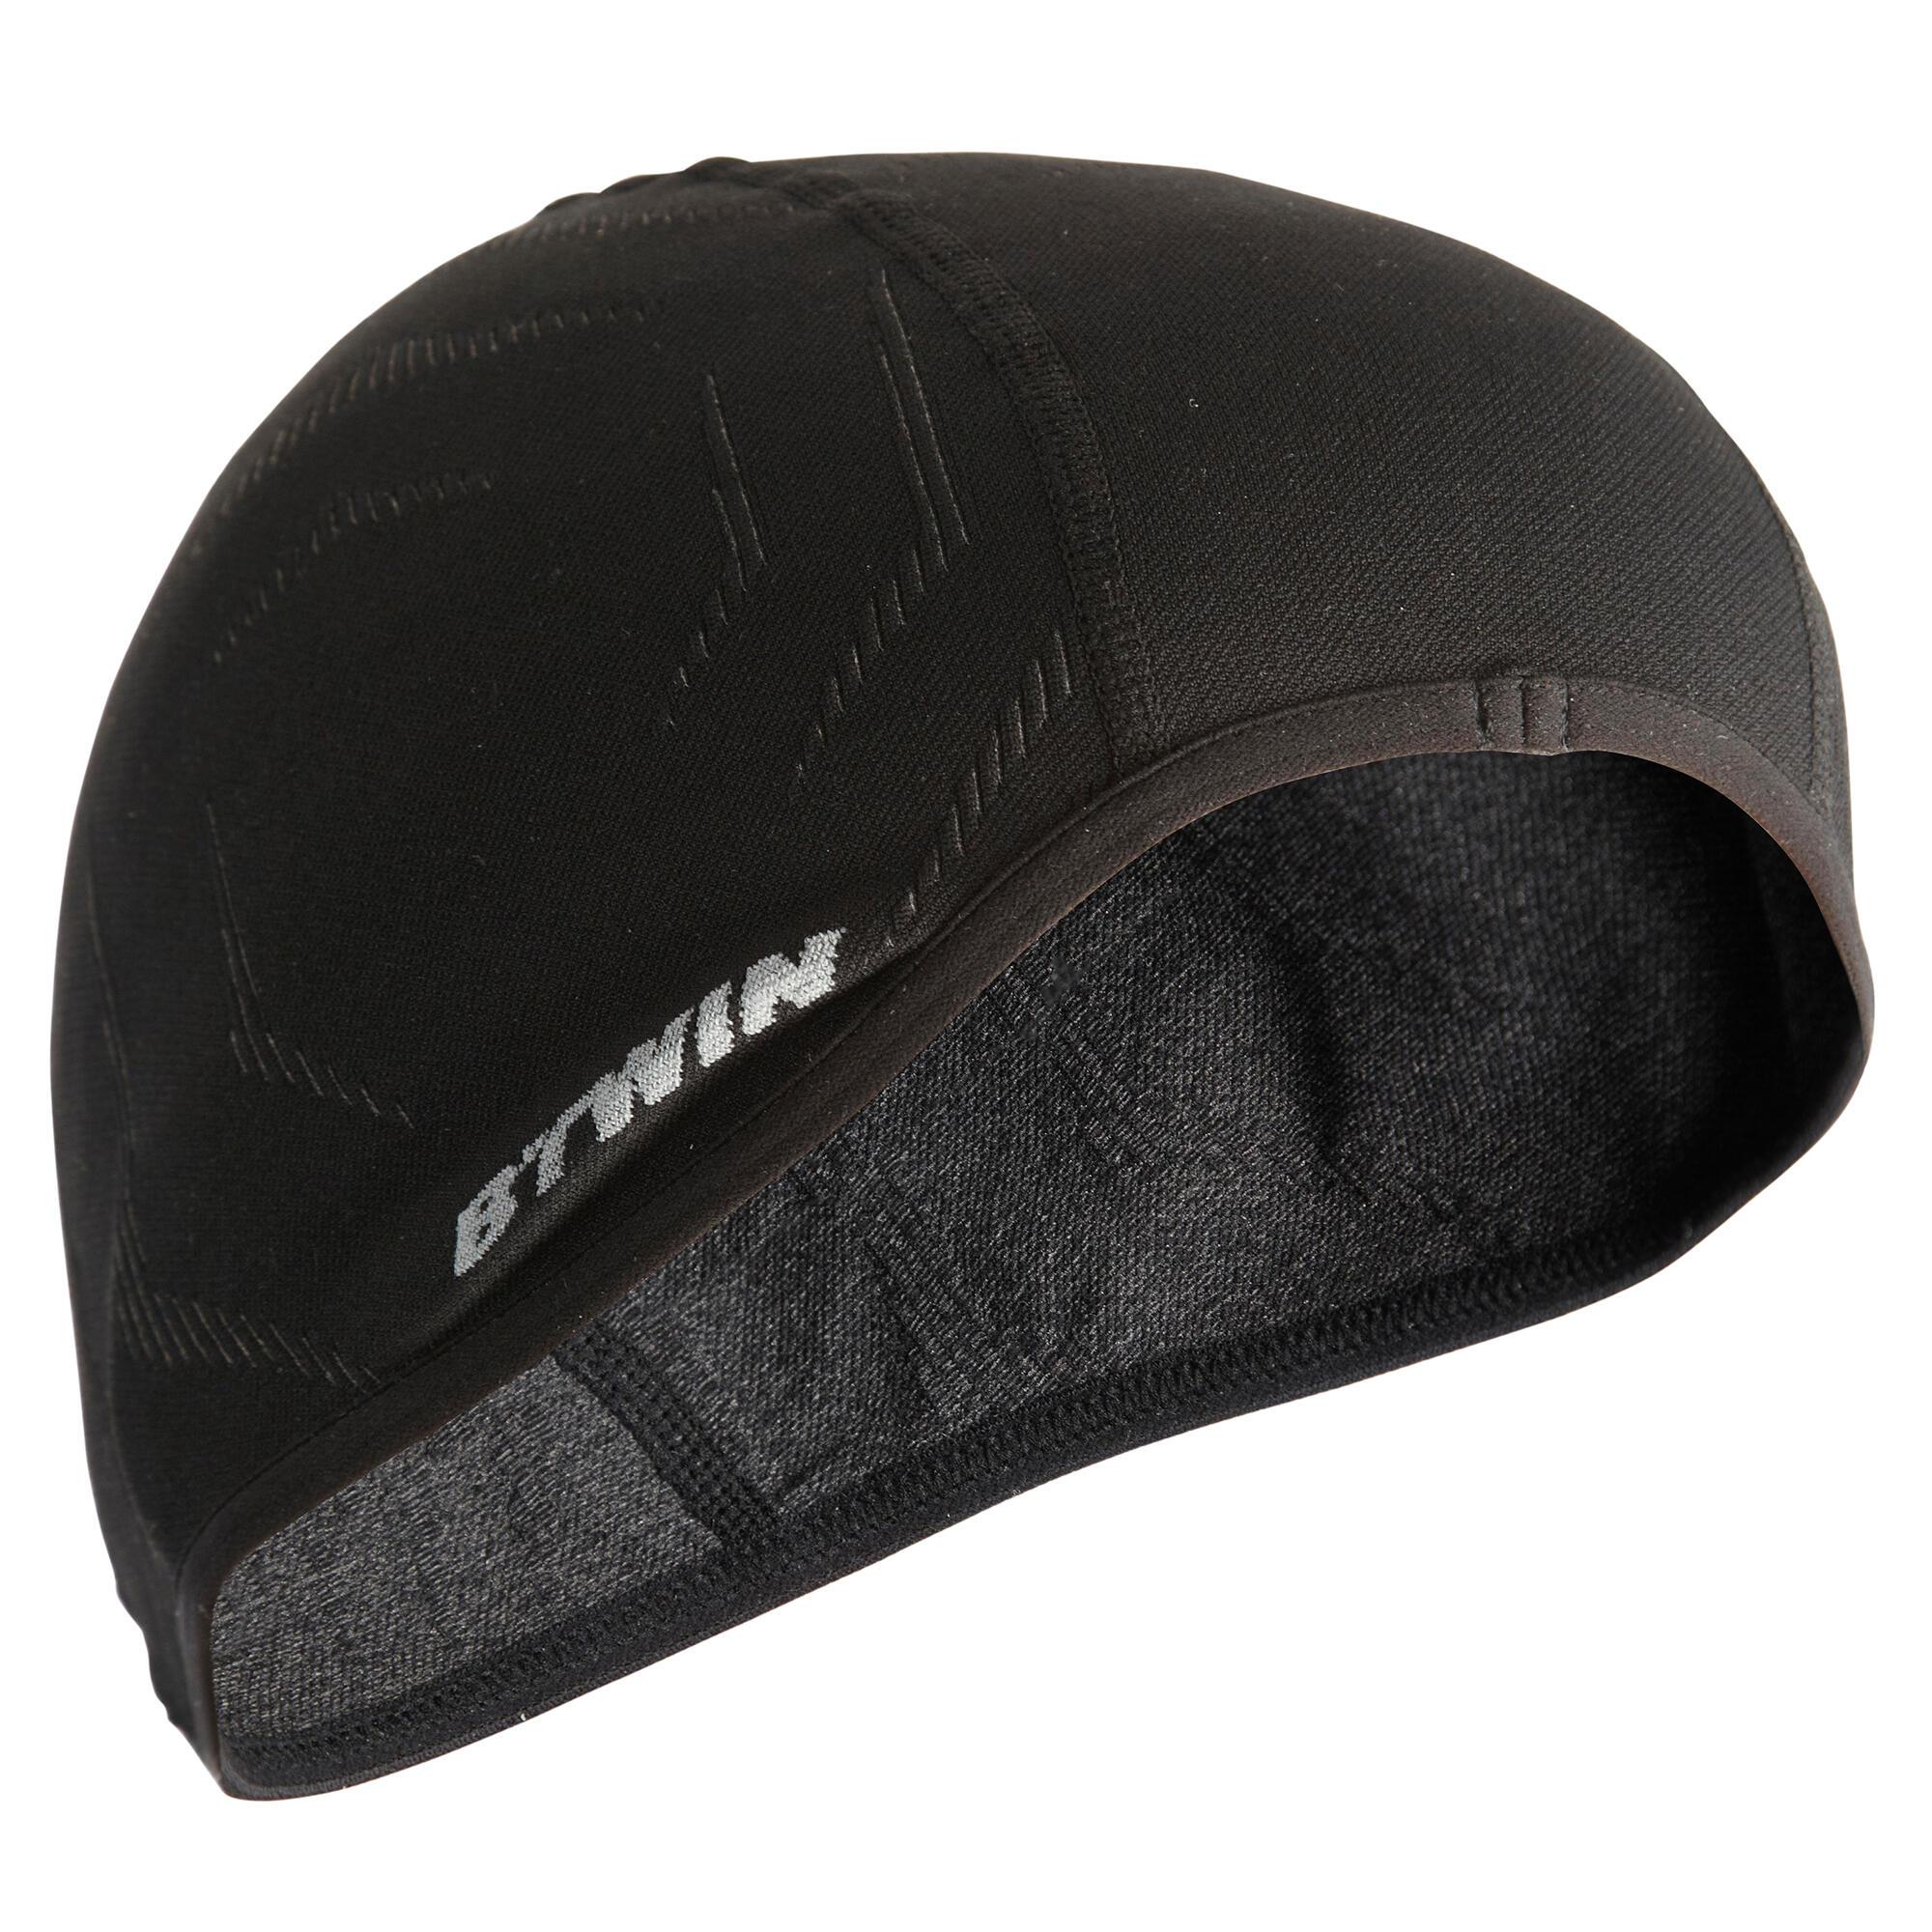 500 Seamless Cycling Helmet Liner - Black